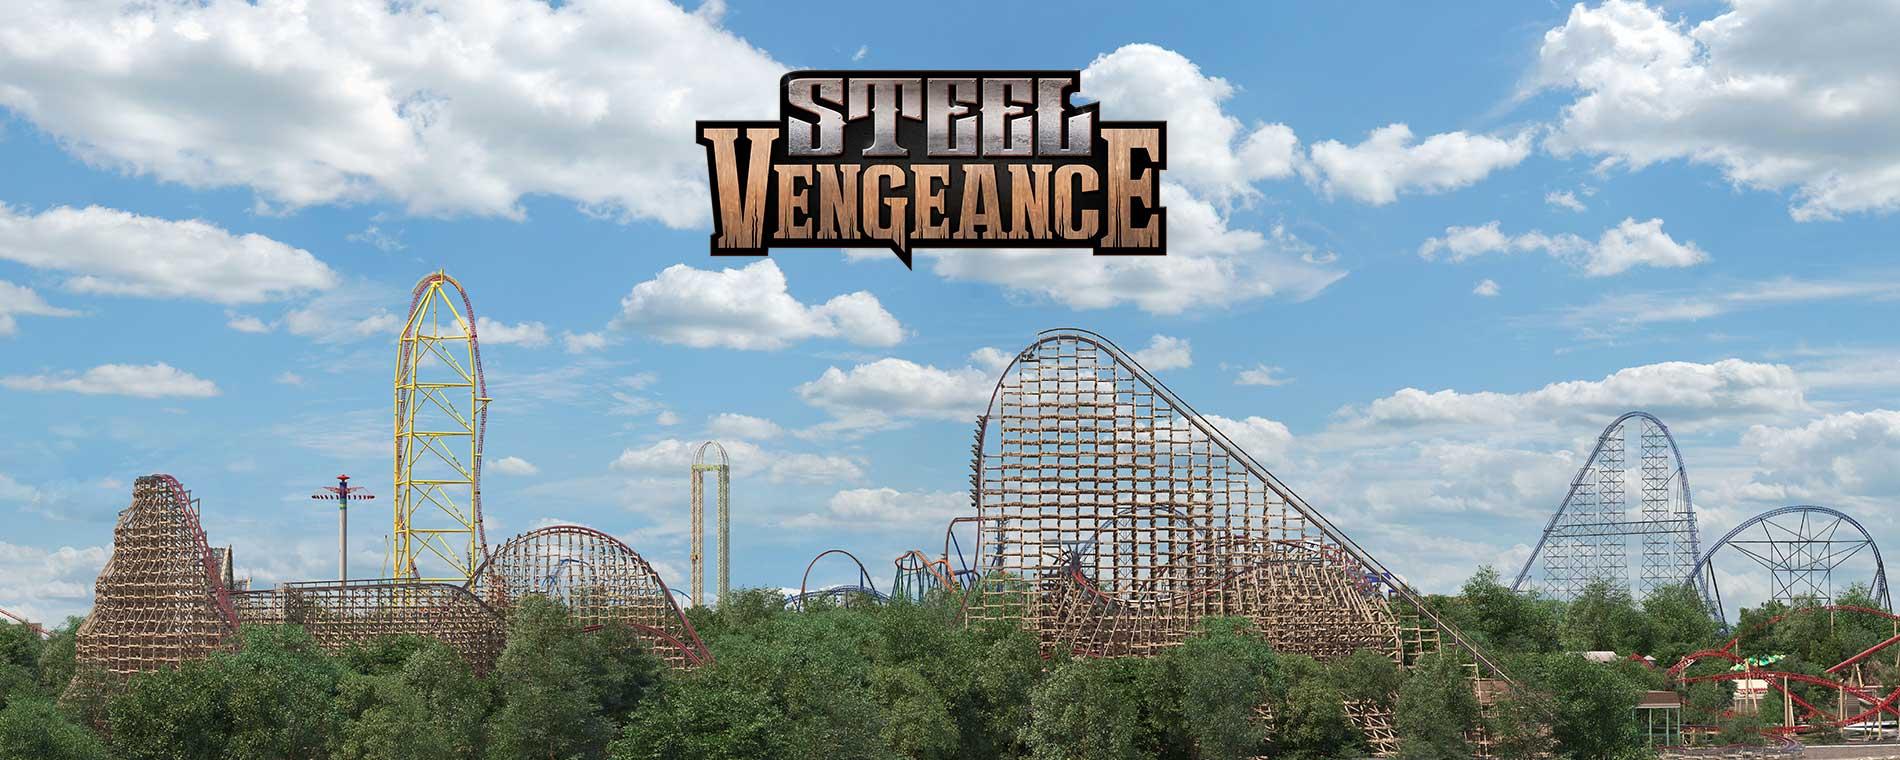 Steel Vengeance | Hyper-Hybrid Record-Breaking Coaster | Cedar Point